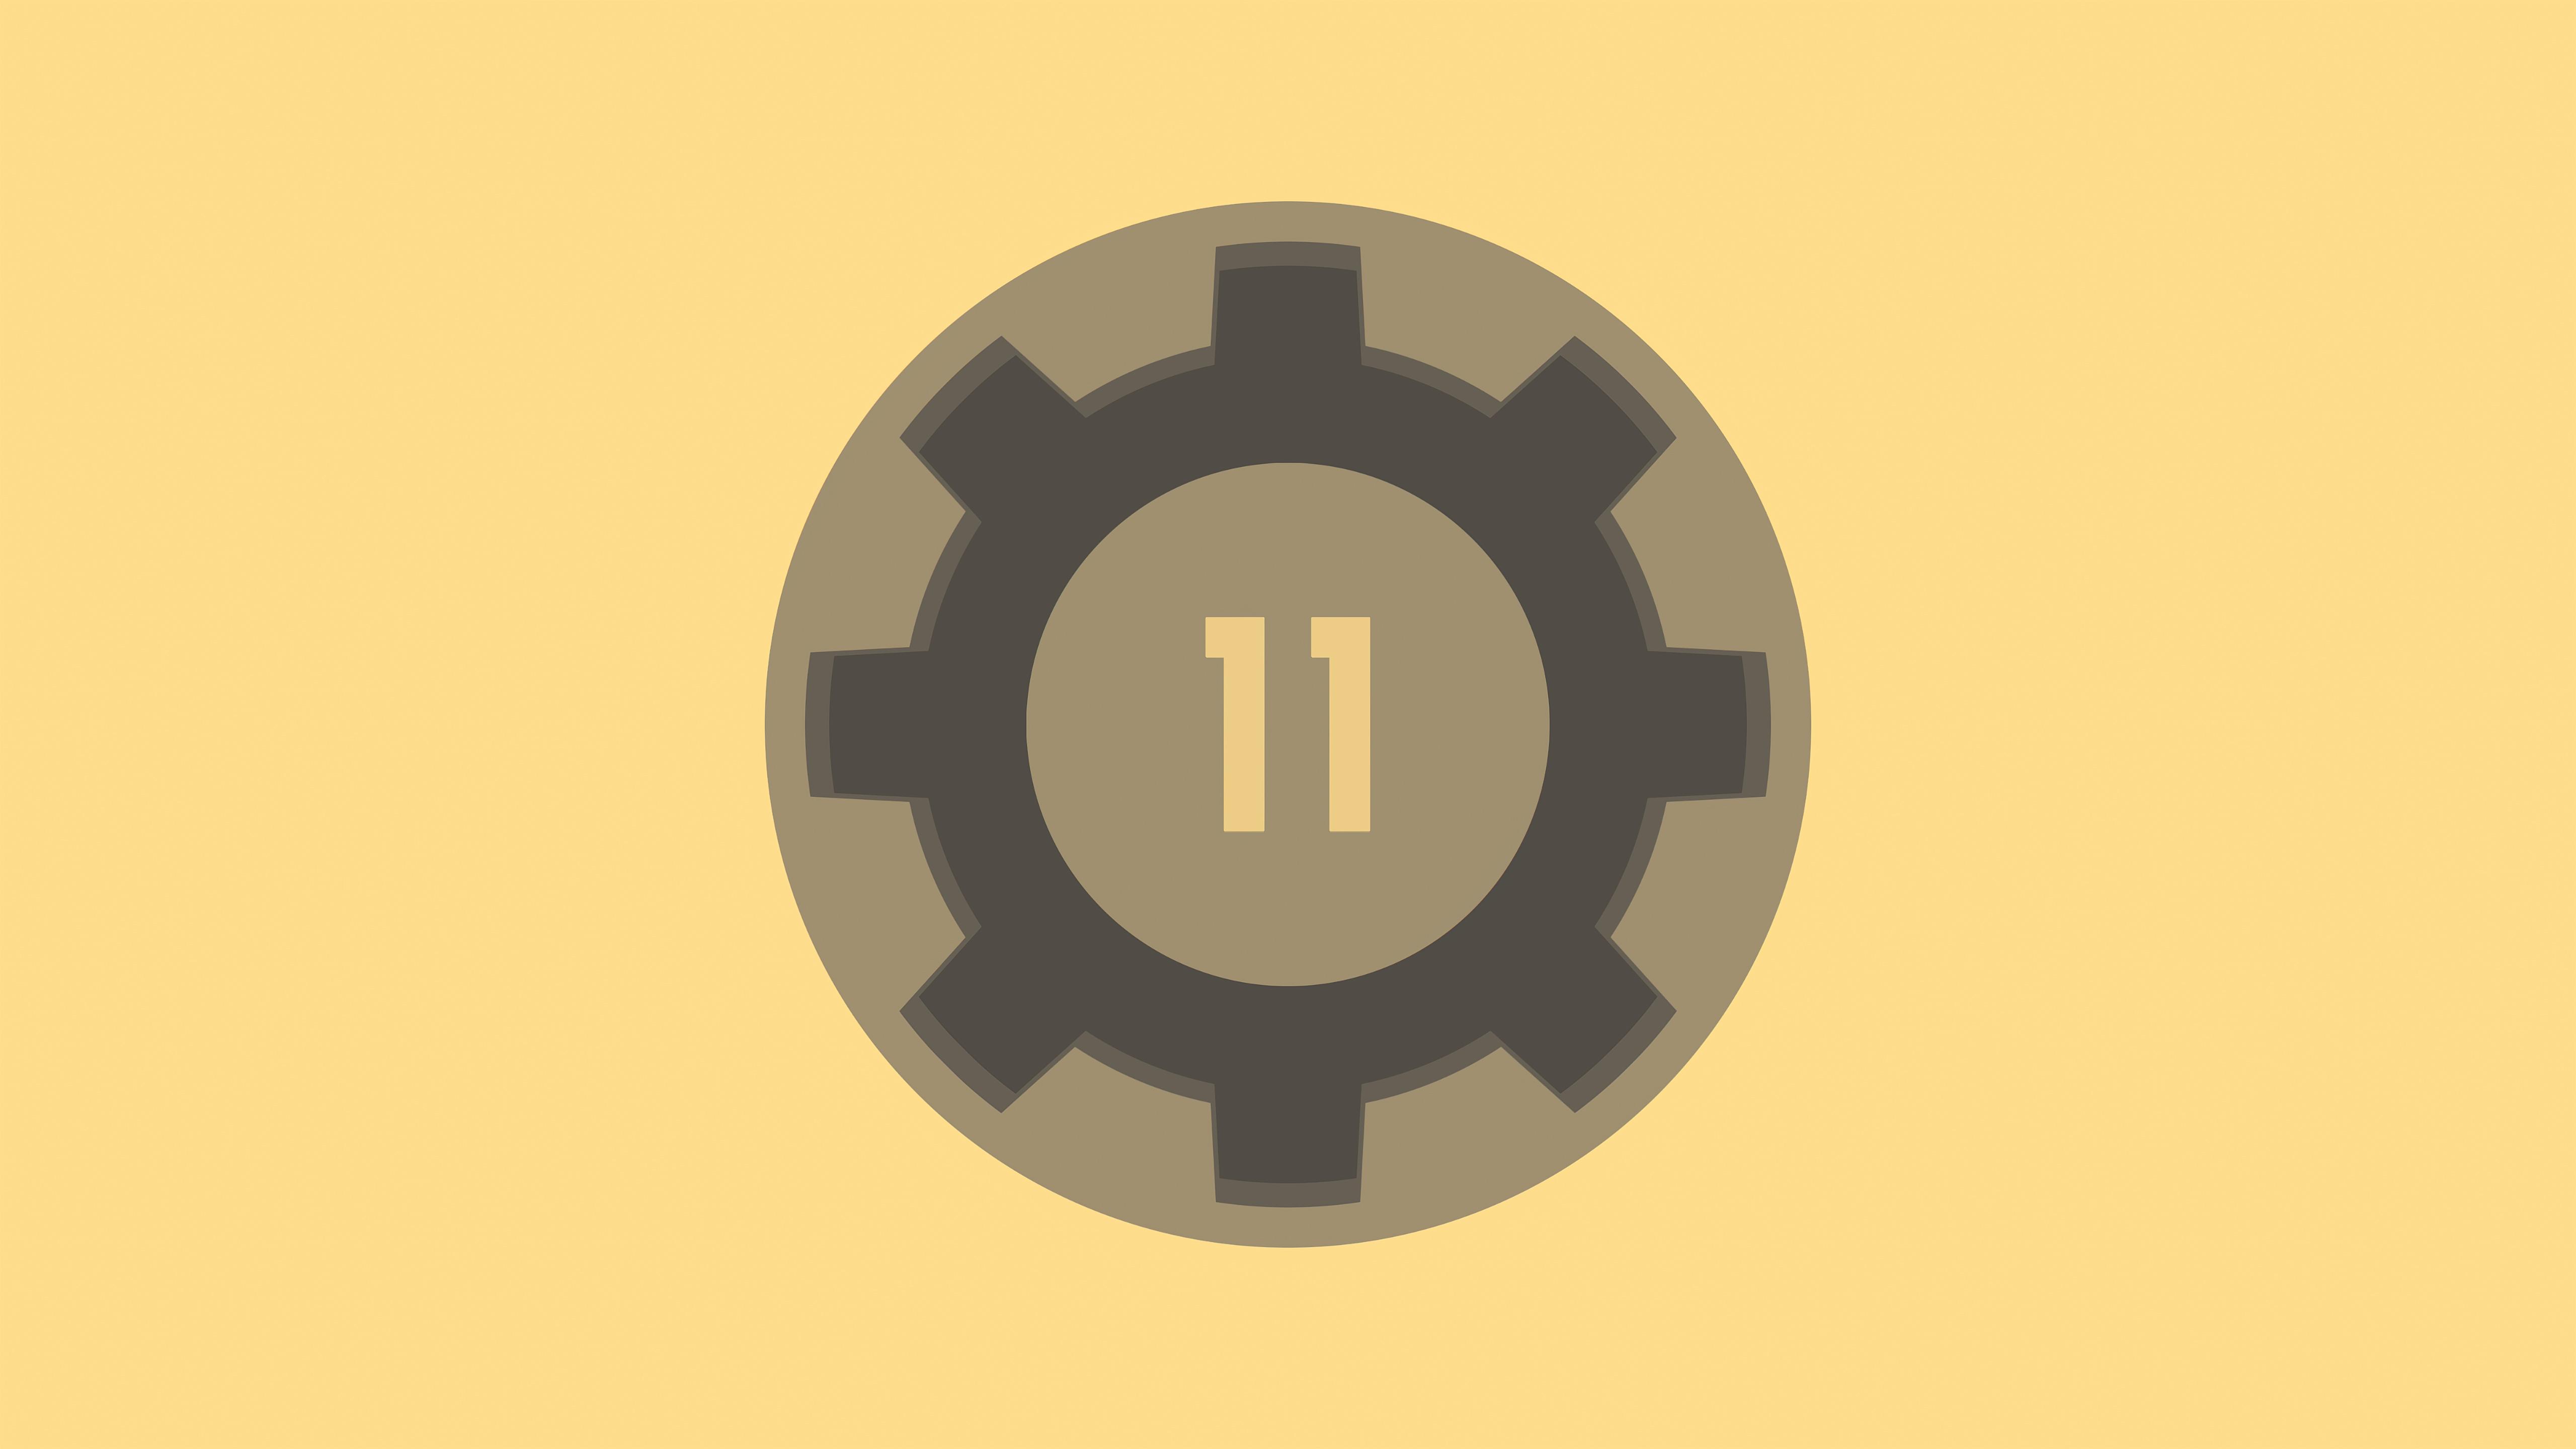 fallout 3 vault 11 minimal 4k 1618137022 - Fallout 3 Vault 11 Minimal 4k - Fallout 3 Vault 11 Minimal 4k wallpapers